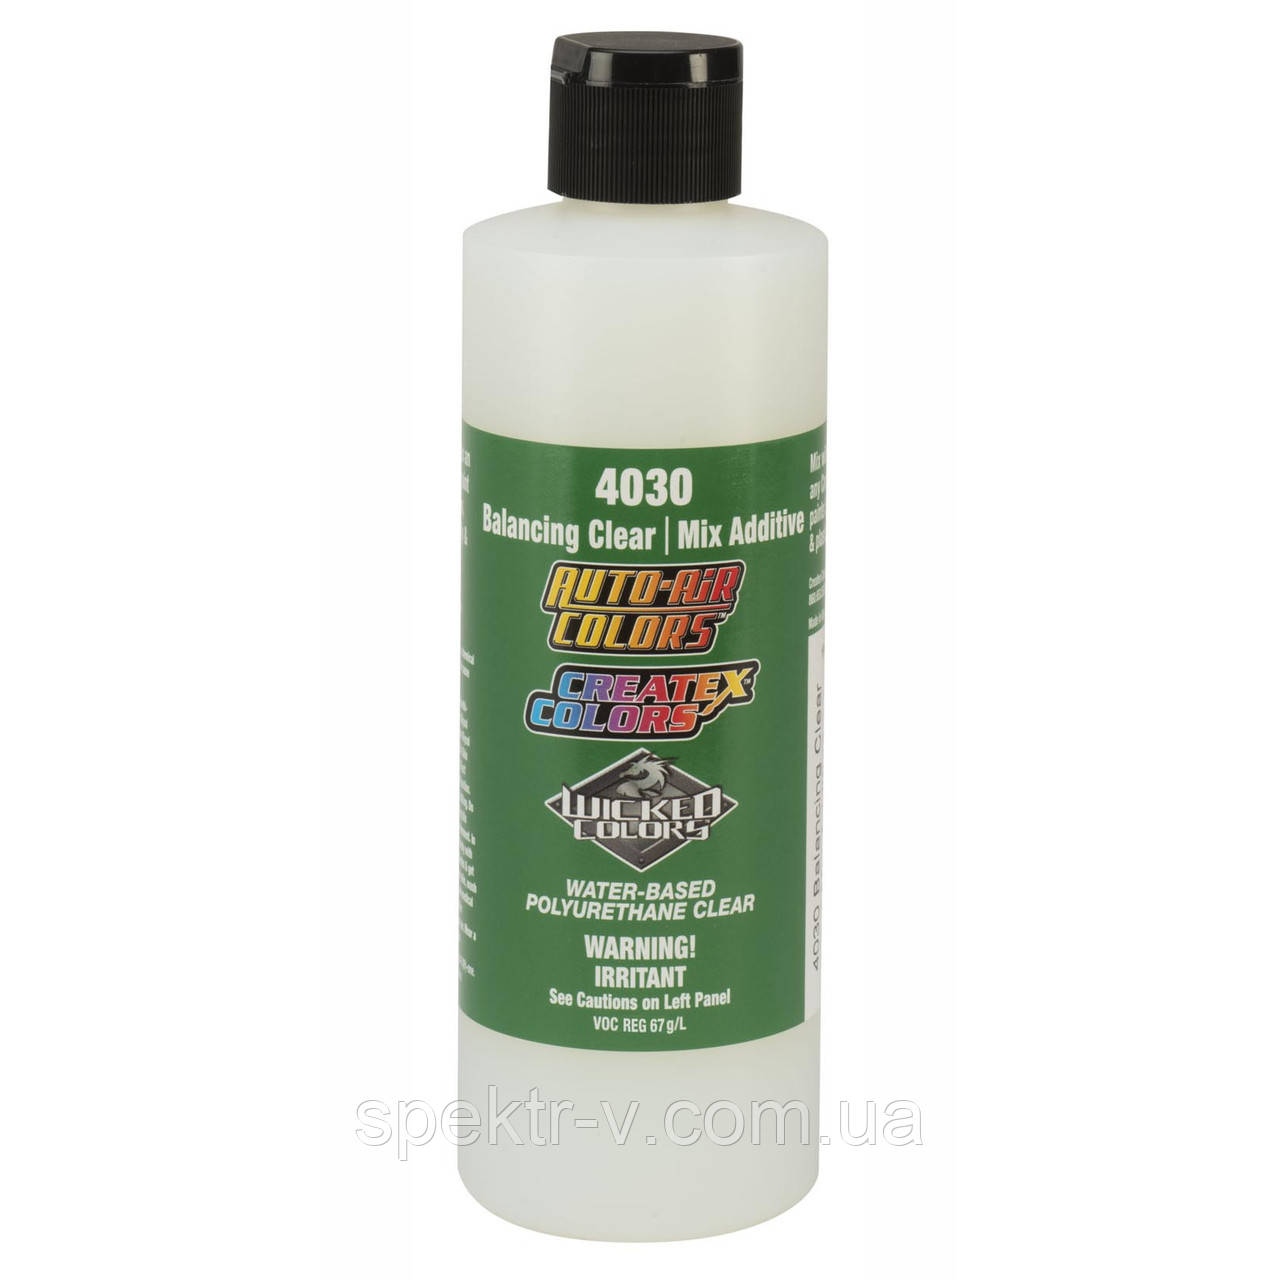 Уретановая добавка для красок Createx 4030 Balancing Clear, 60 мл